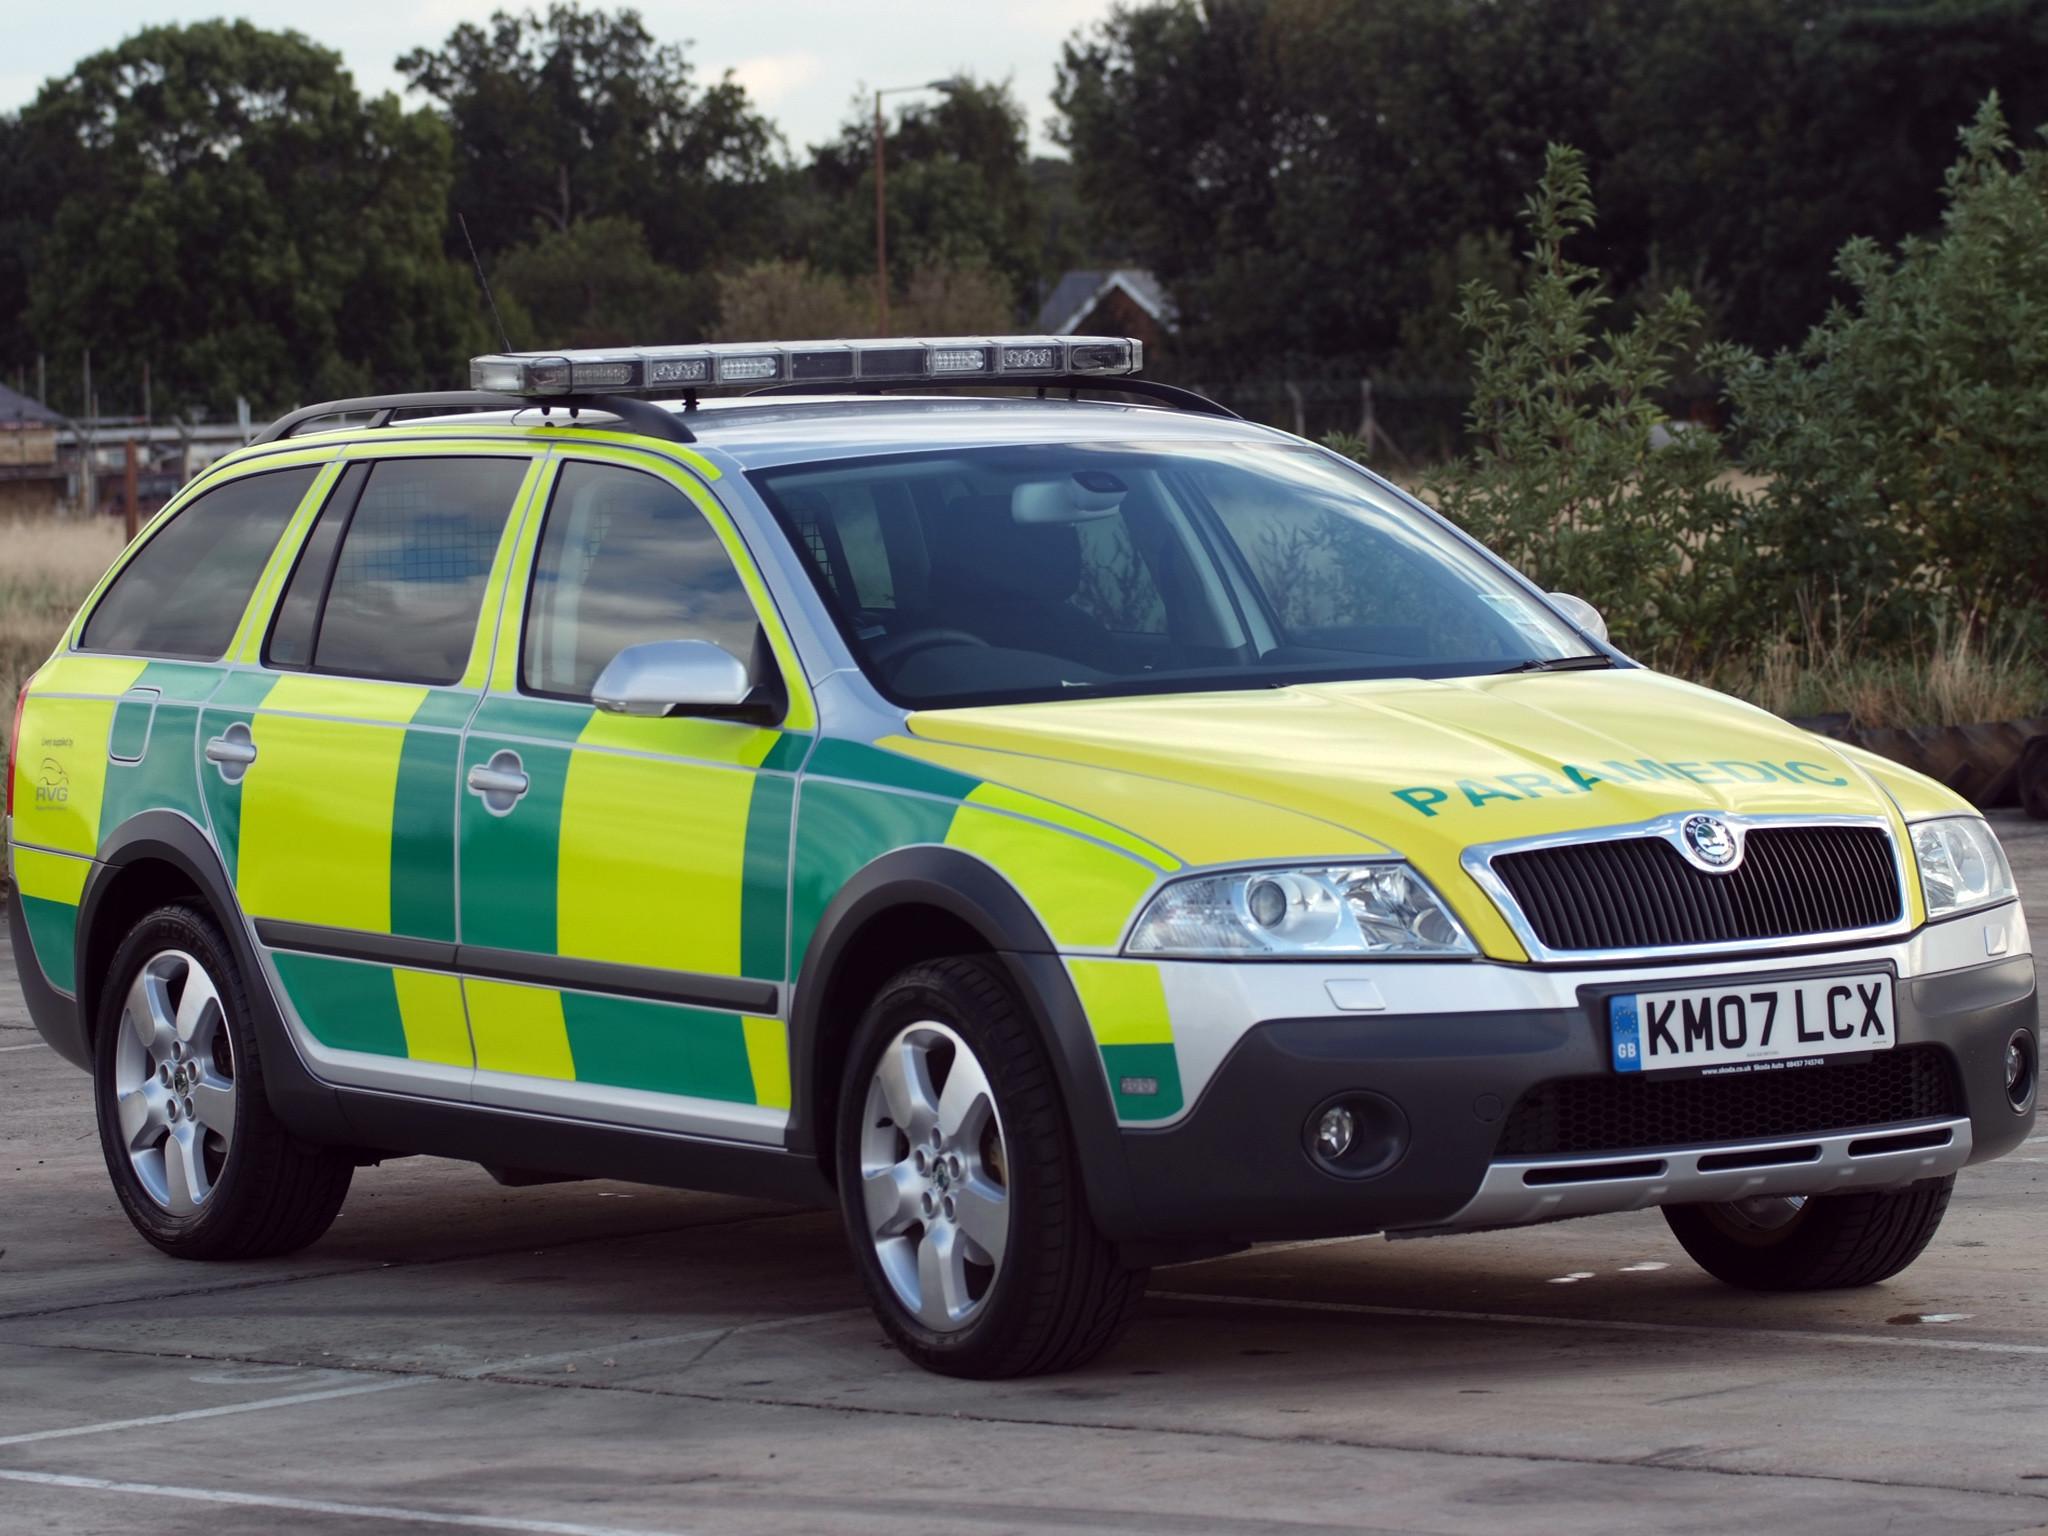 Res: 2048x1536, 2007 Skoda Octavia Scout Paramedic 1Z ambulance emergency wallpaper       151465   WallpaperUP